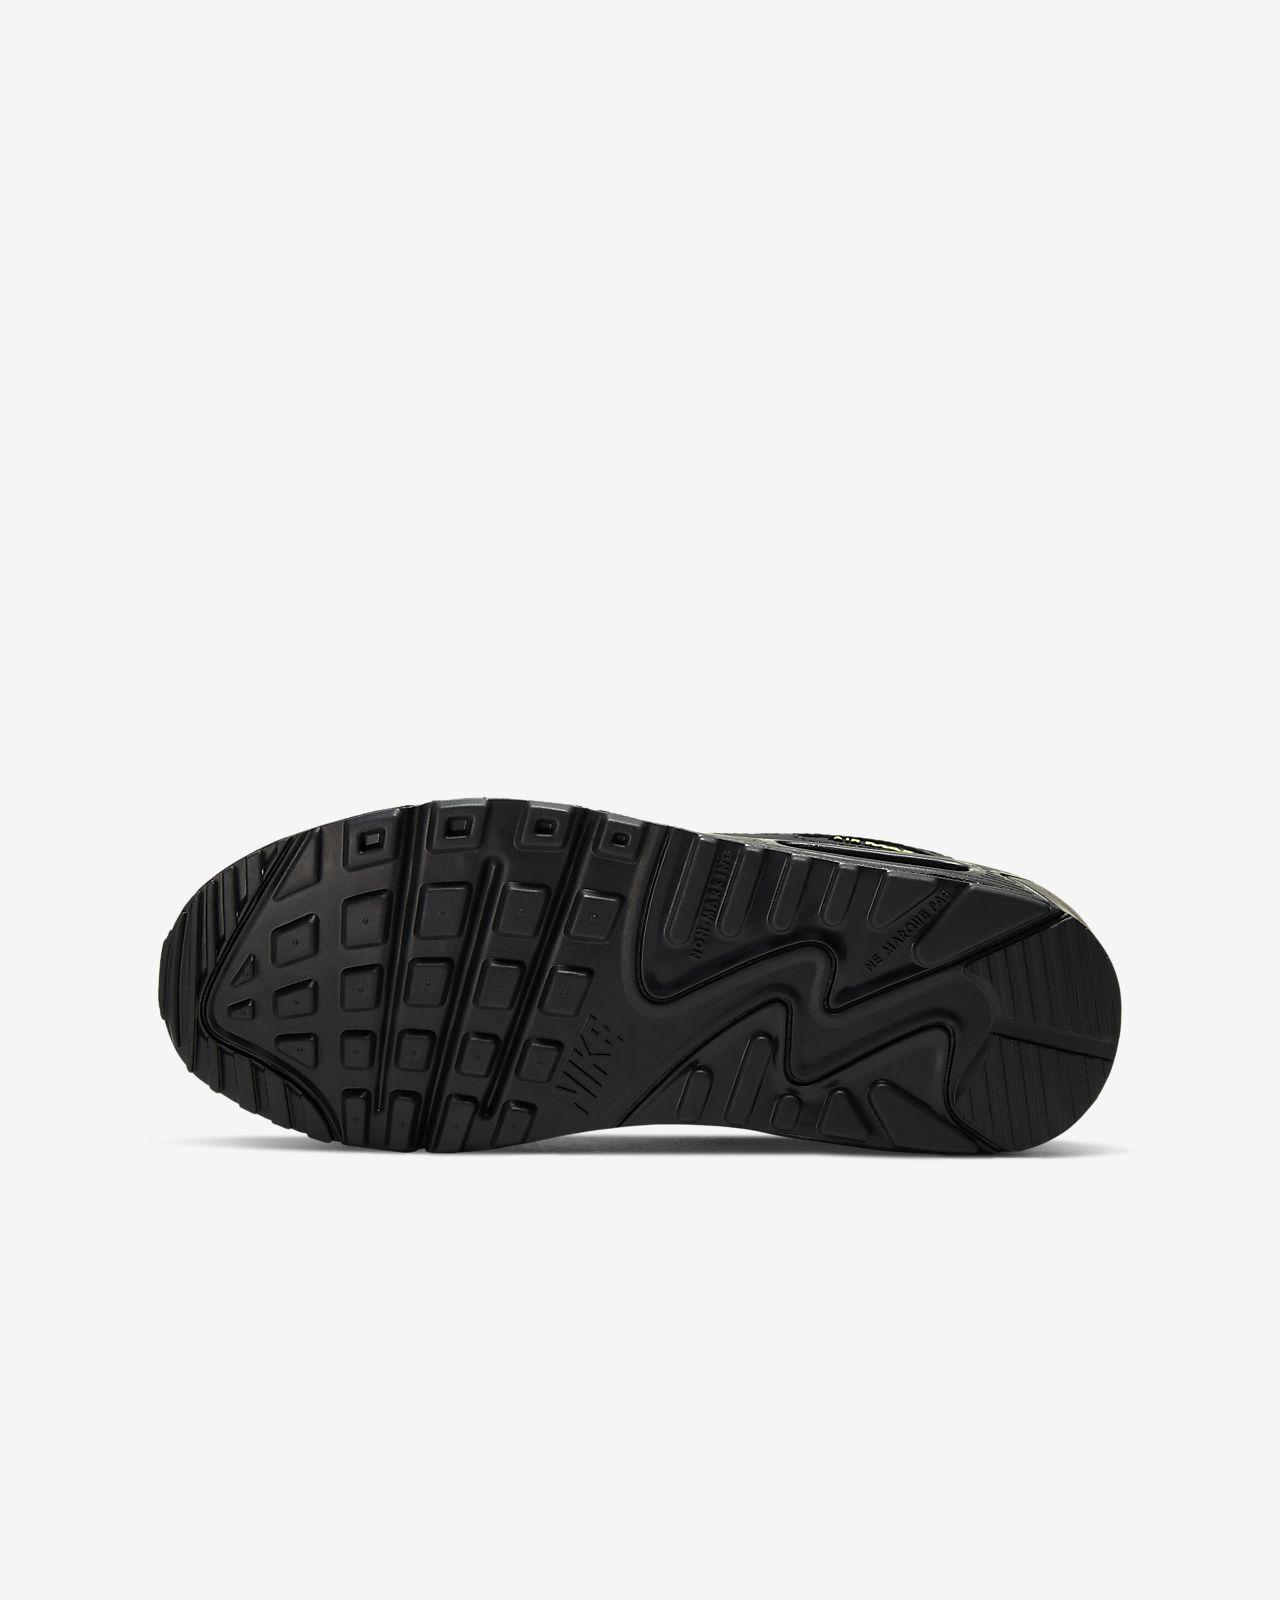 Baskets Air Max 90 pour Enfant. Nike MA